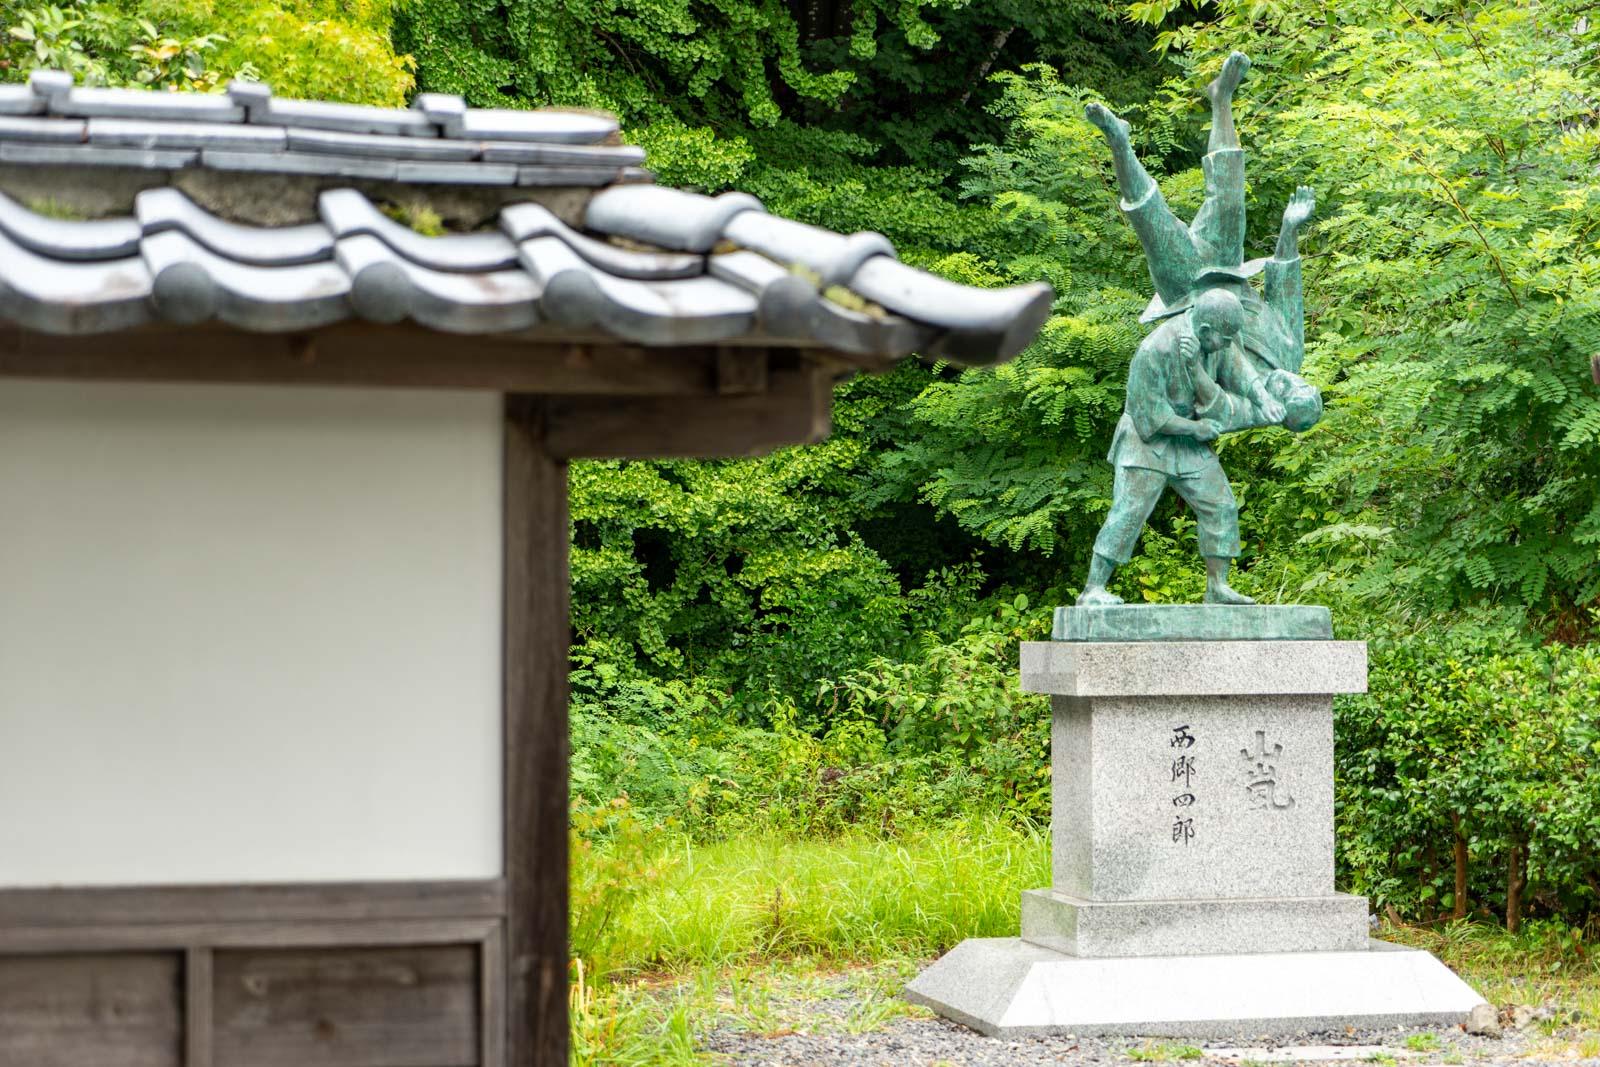 Samurai history, Aizu-Wakamatsu, Japan